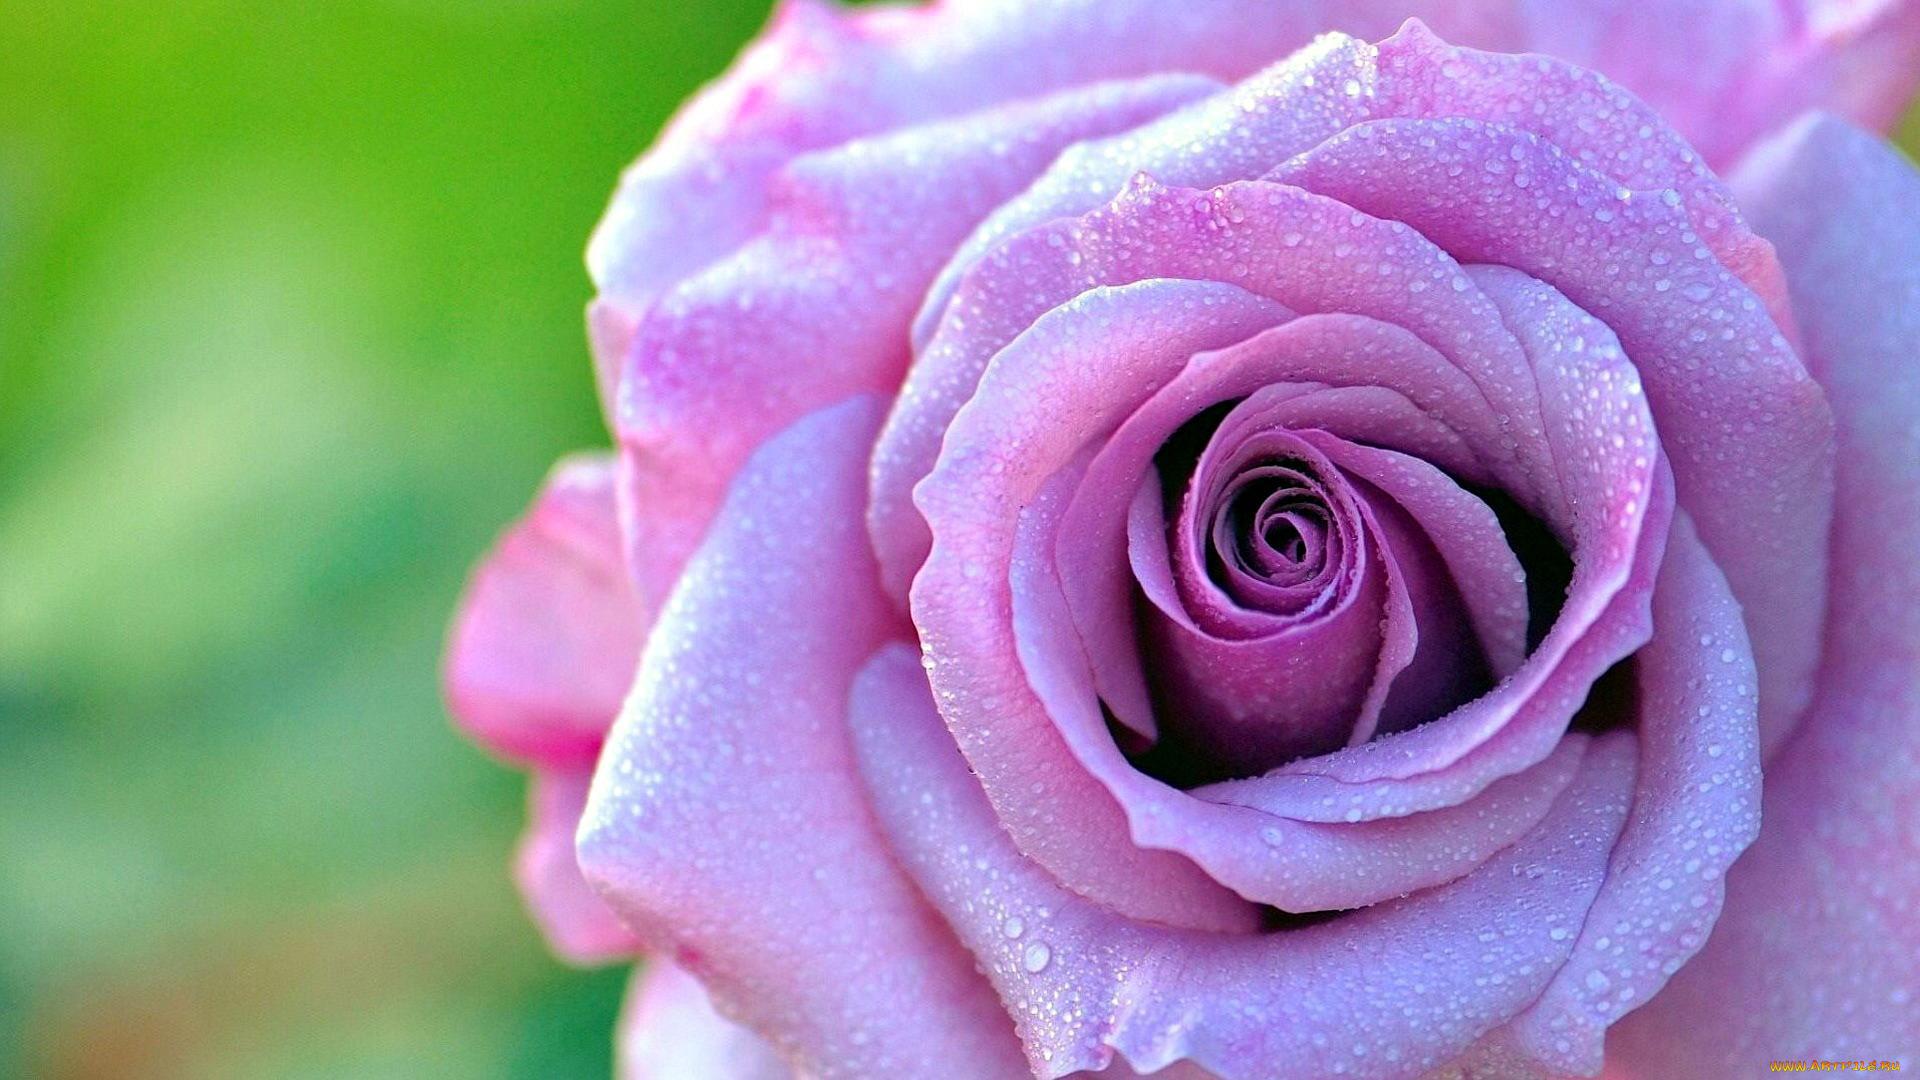 Сталкер картинках, сиреневые розы картинки